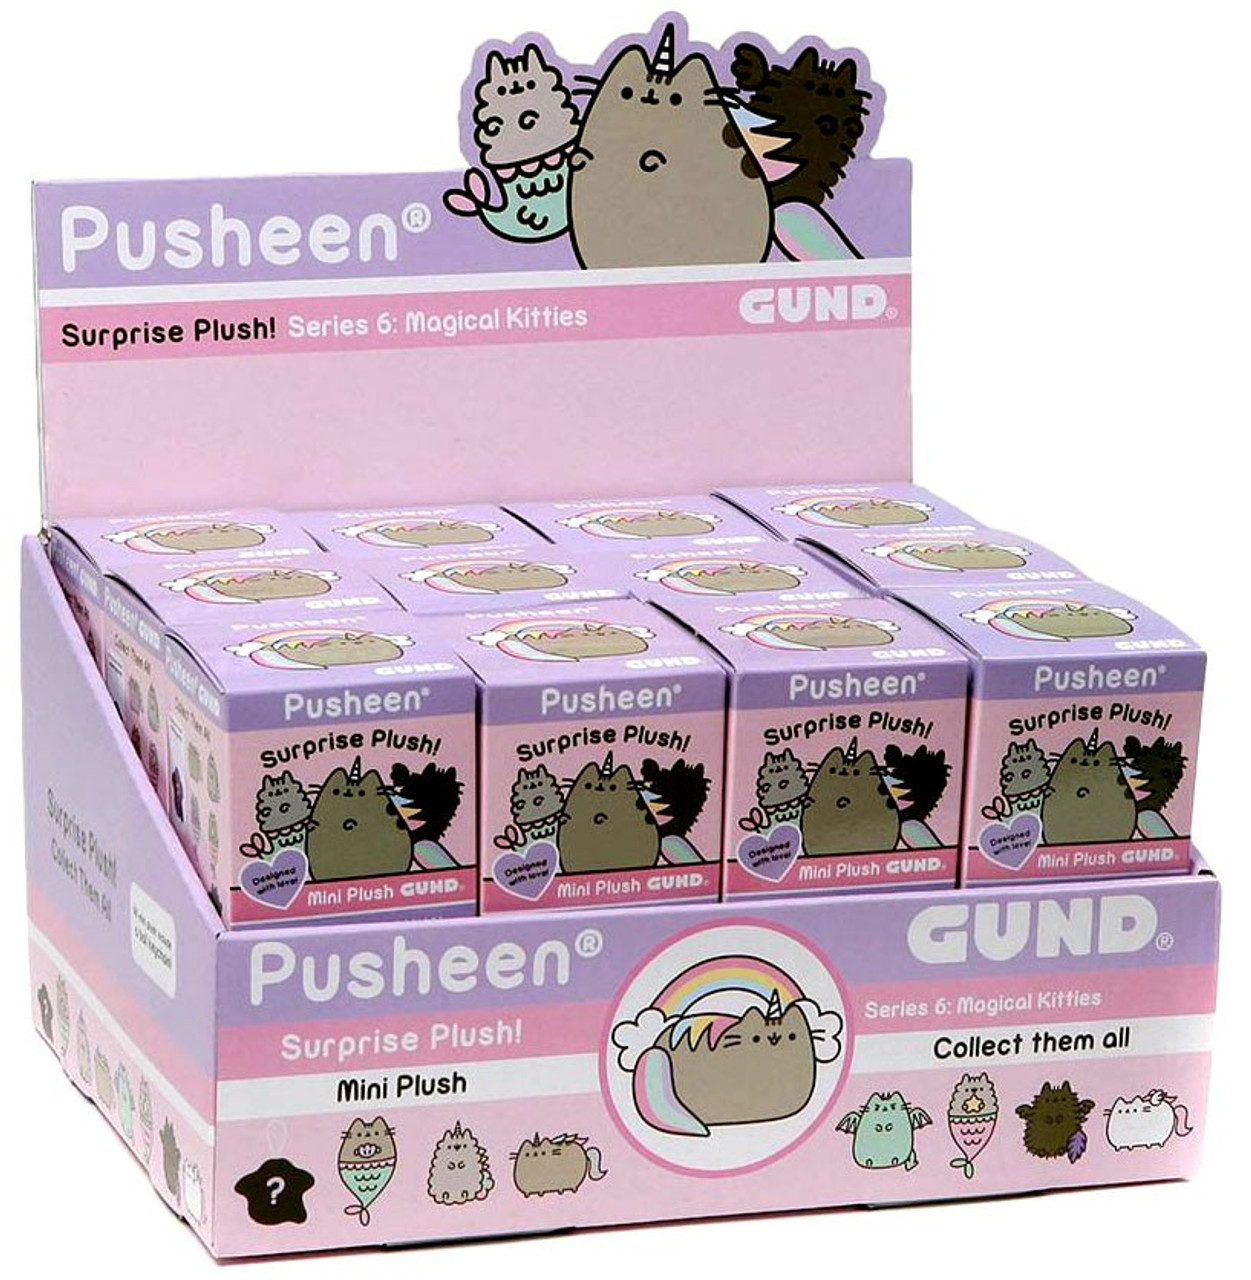 Magical Kitties 1 Random Box GUND Pusheen Surprise Plush Blind Box Series 6